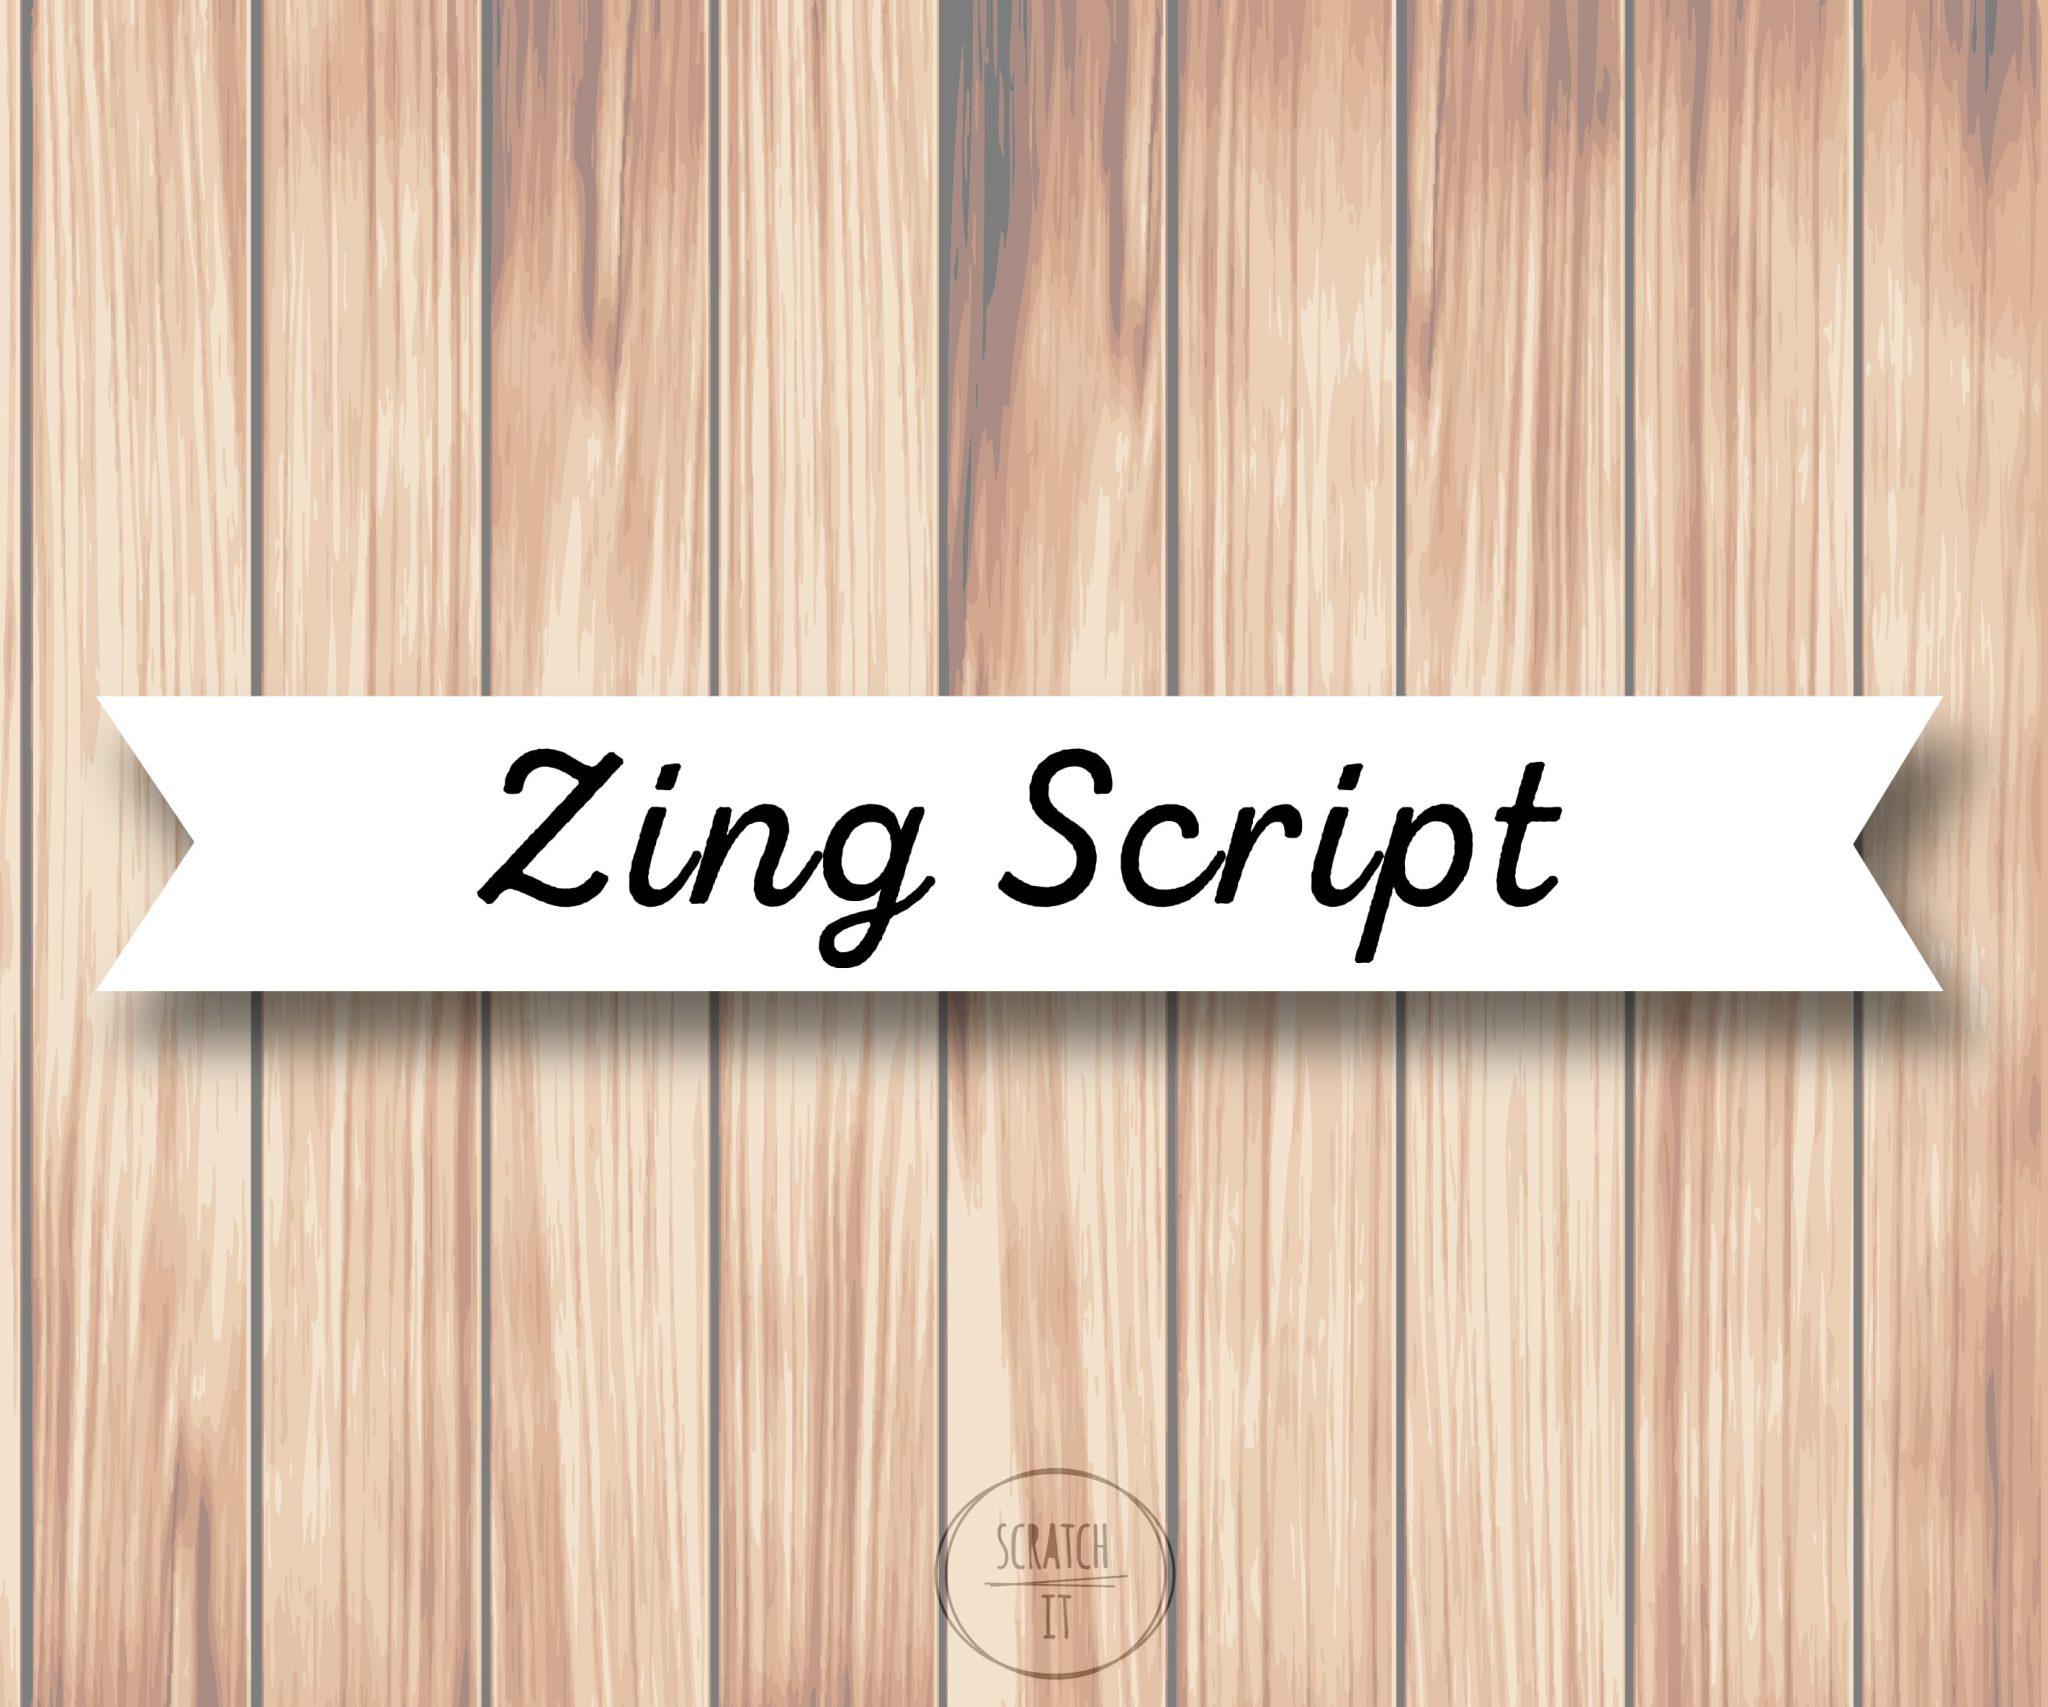 Białe winietki - flaga - ZING SCRIPT